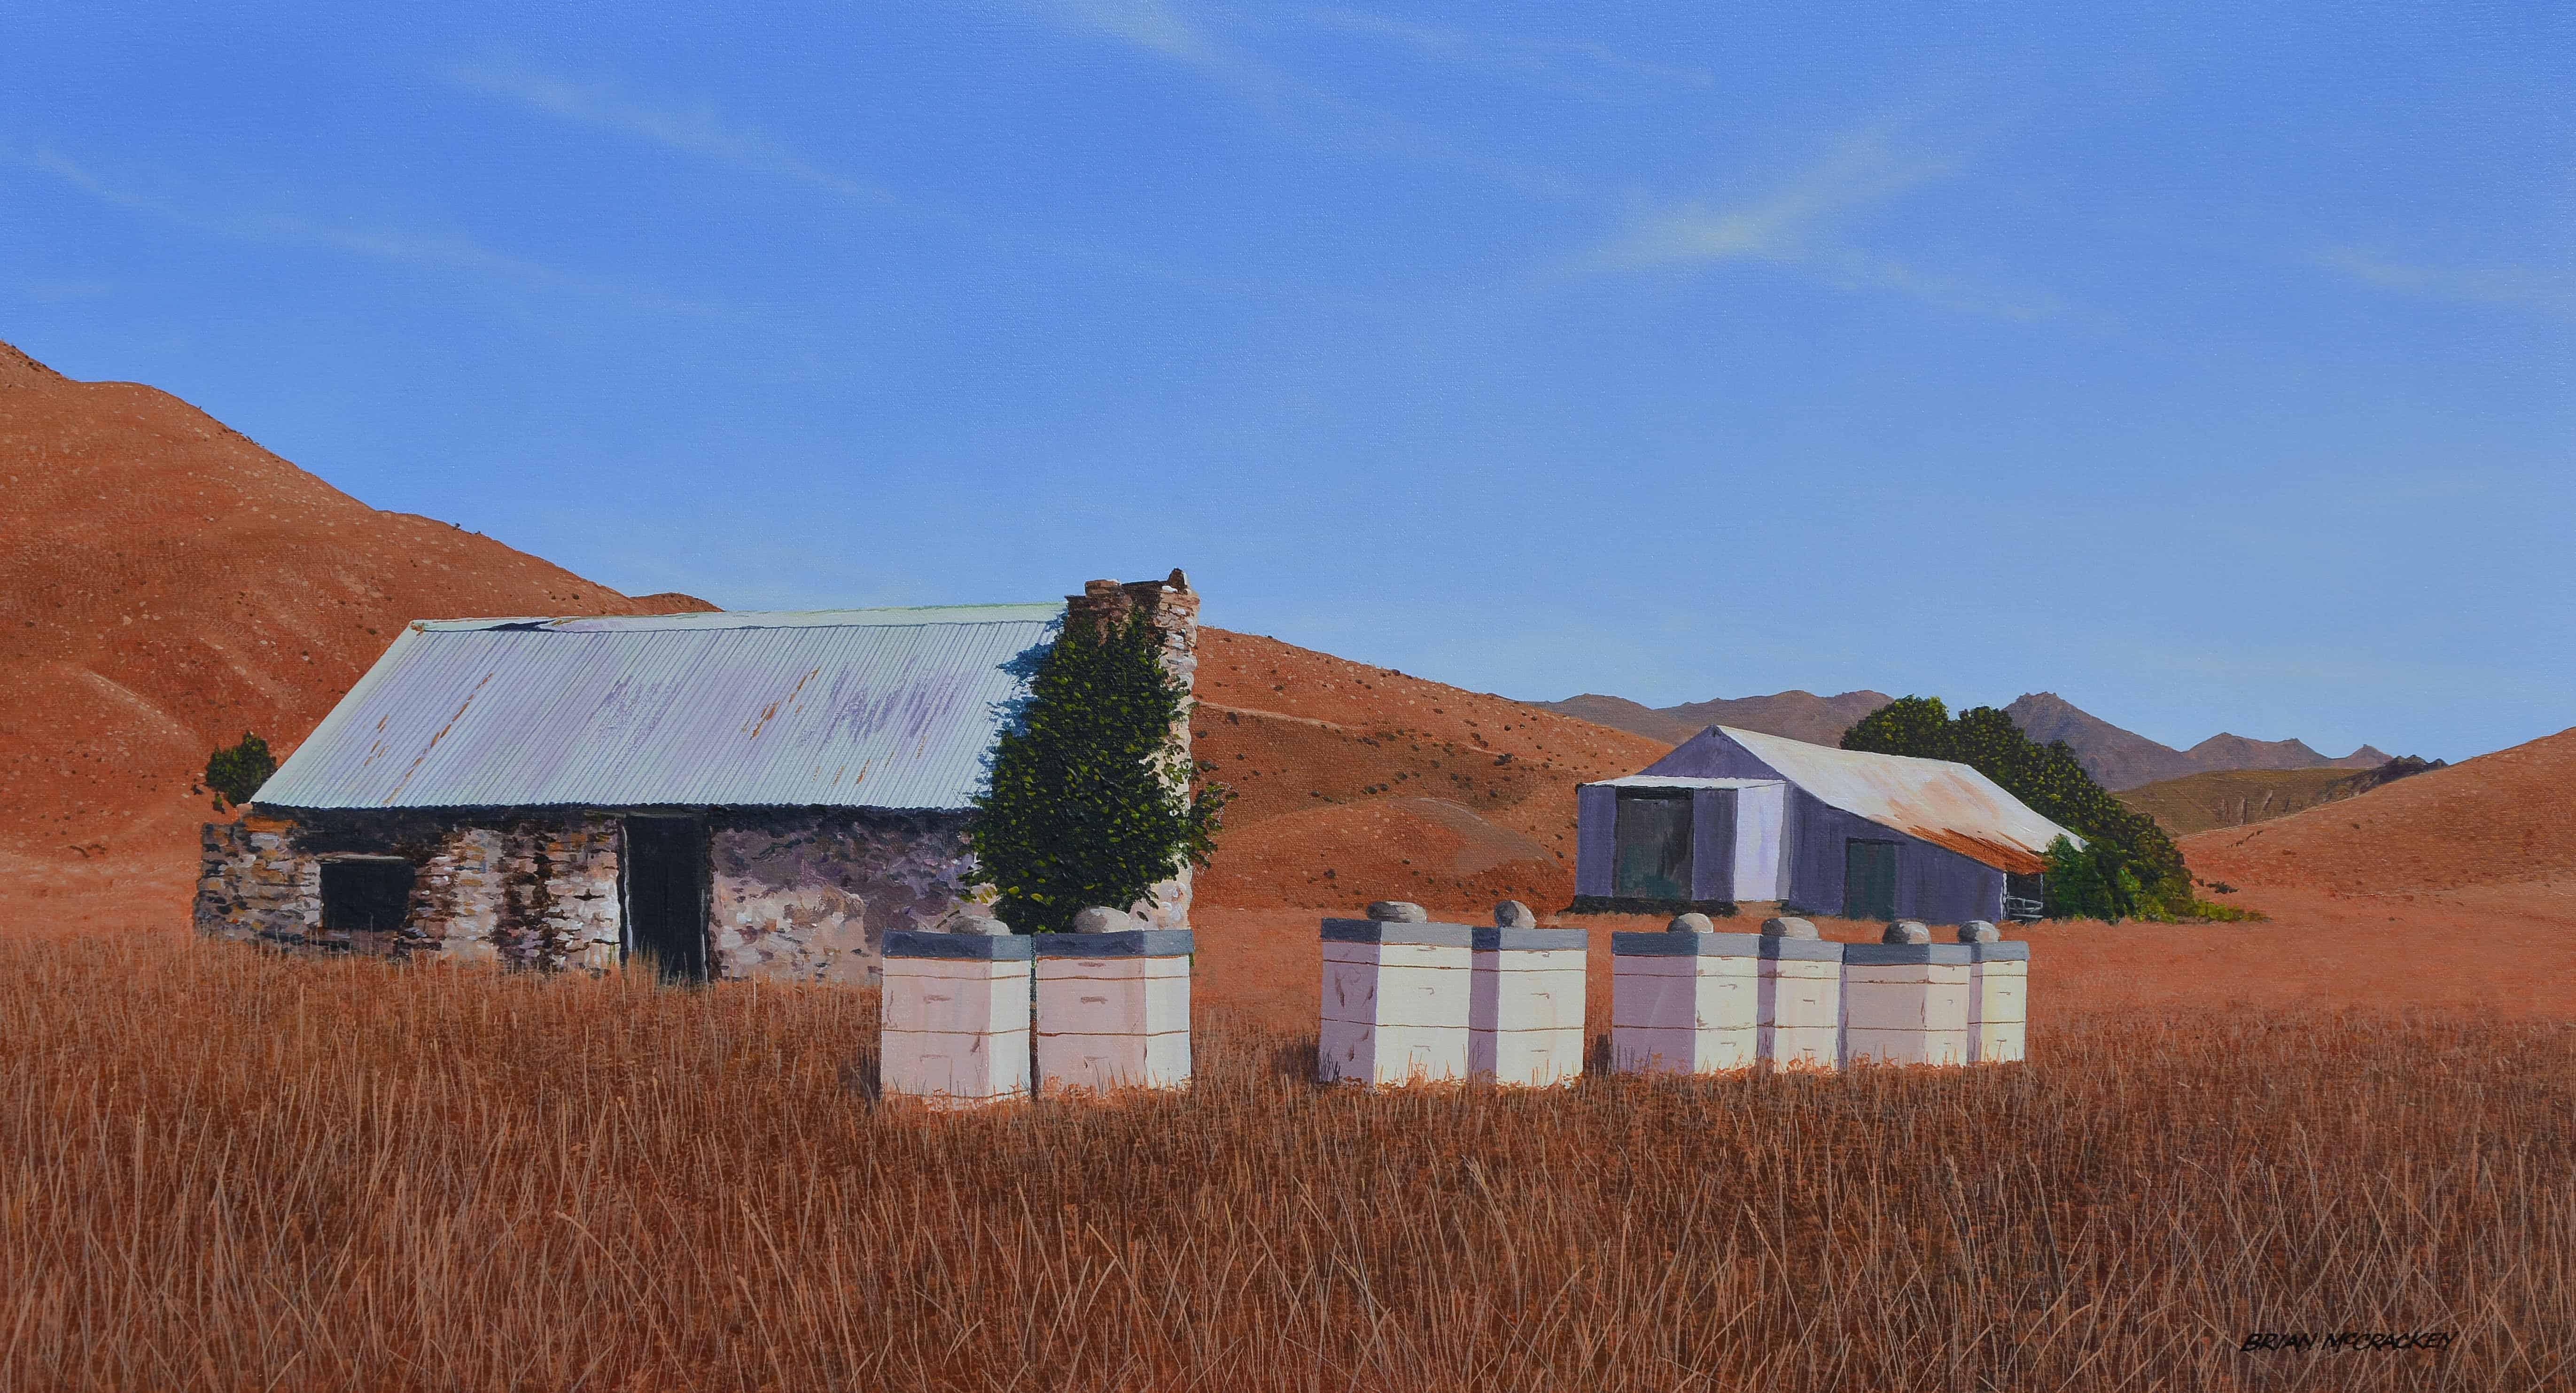 Beehives in Summer Landscape - Otago web